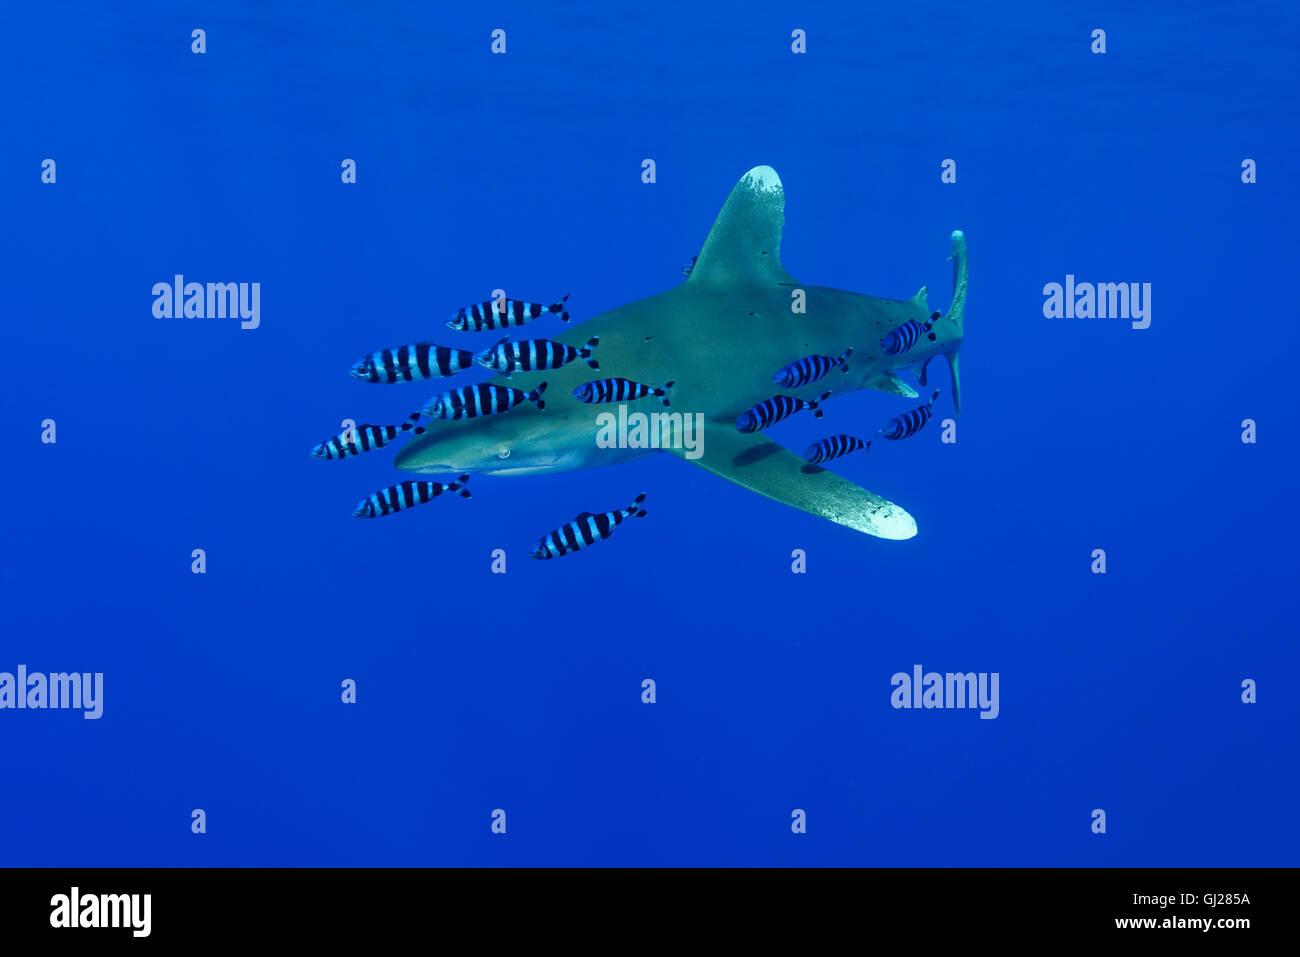 Carcharhinus longimanus, Naucrates ductor, Oceanic whitetip shark with pilot fish, pilotfish, Daedalus Reef, Red - Stock Image